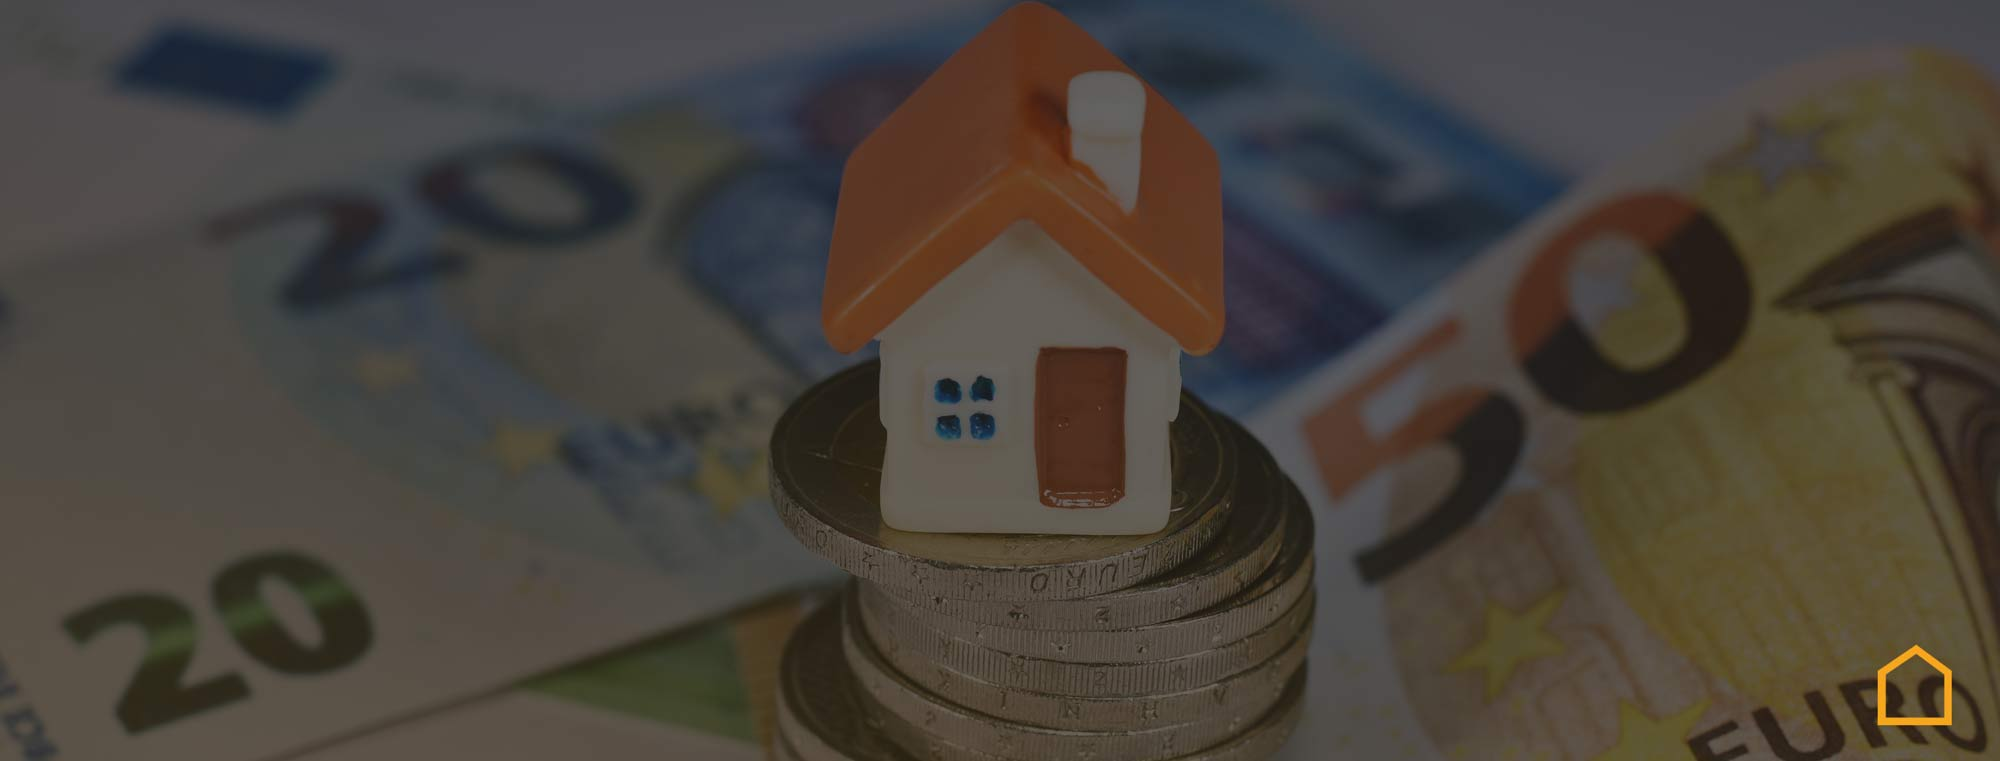 city immobilienmakler lexikon grundsteuer